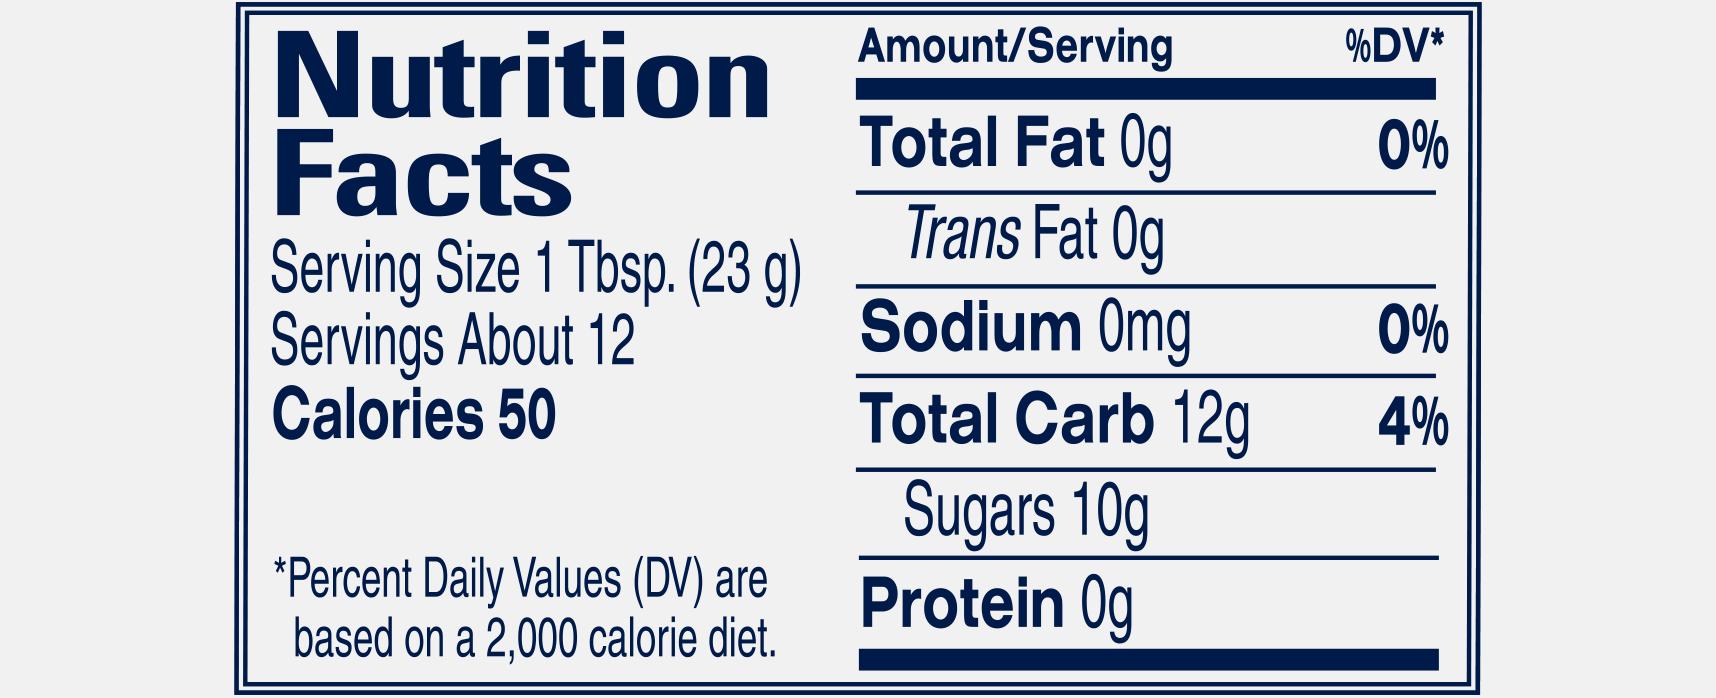 StDalfour_NutritionFacts_MirabellePlum.png